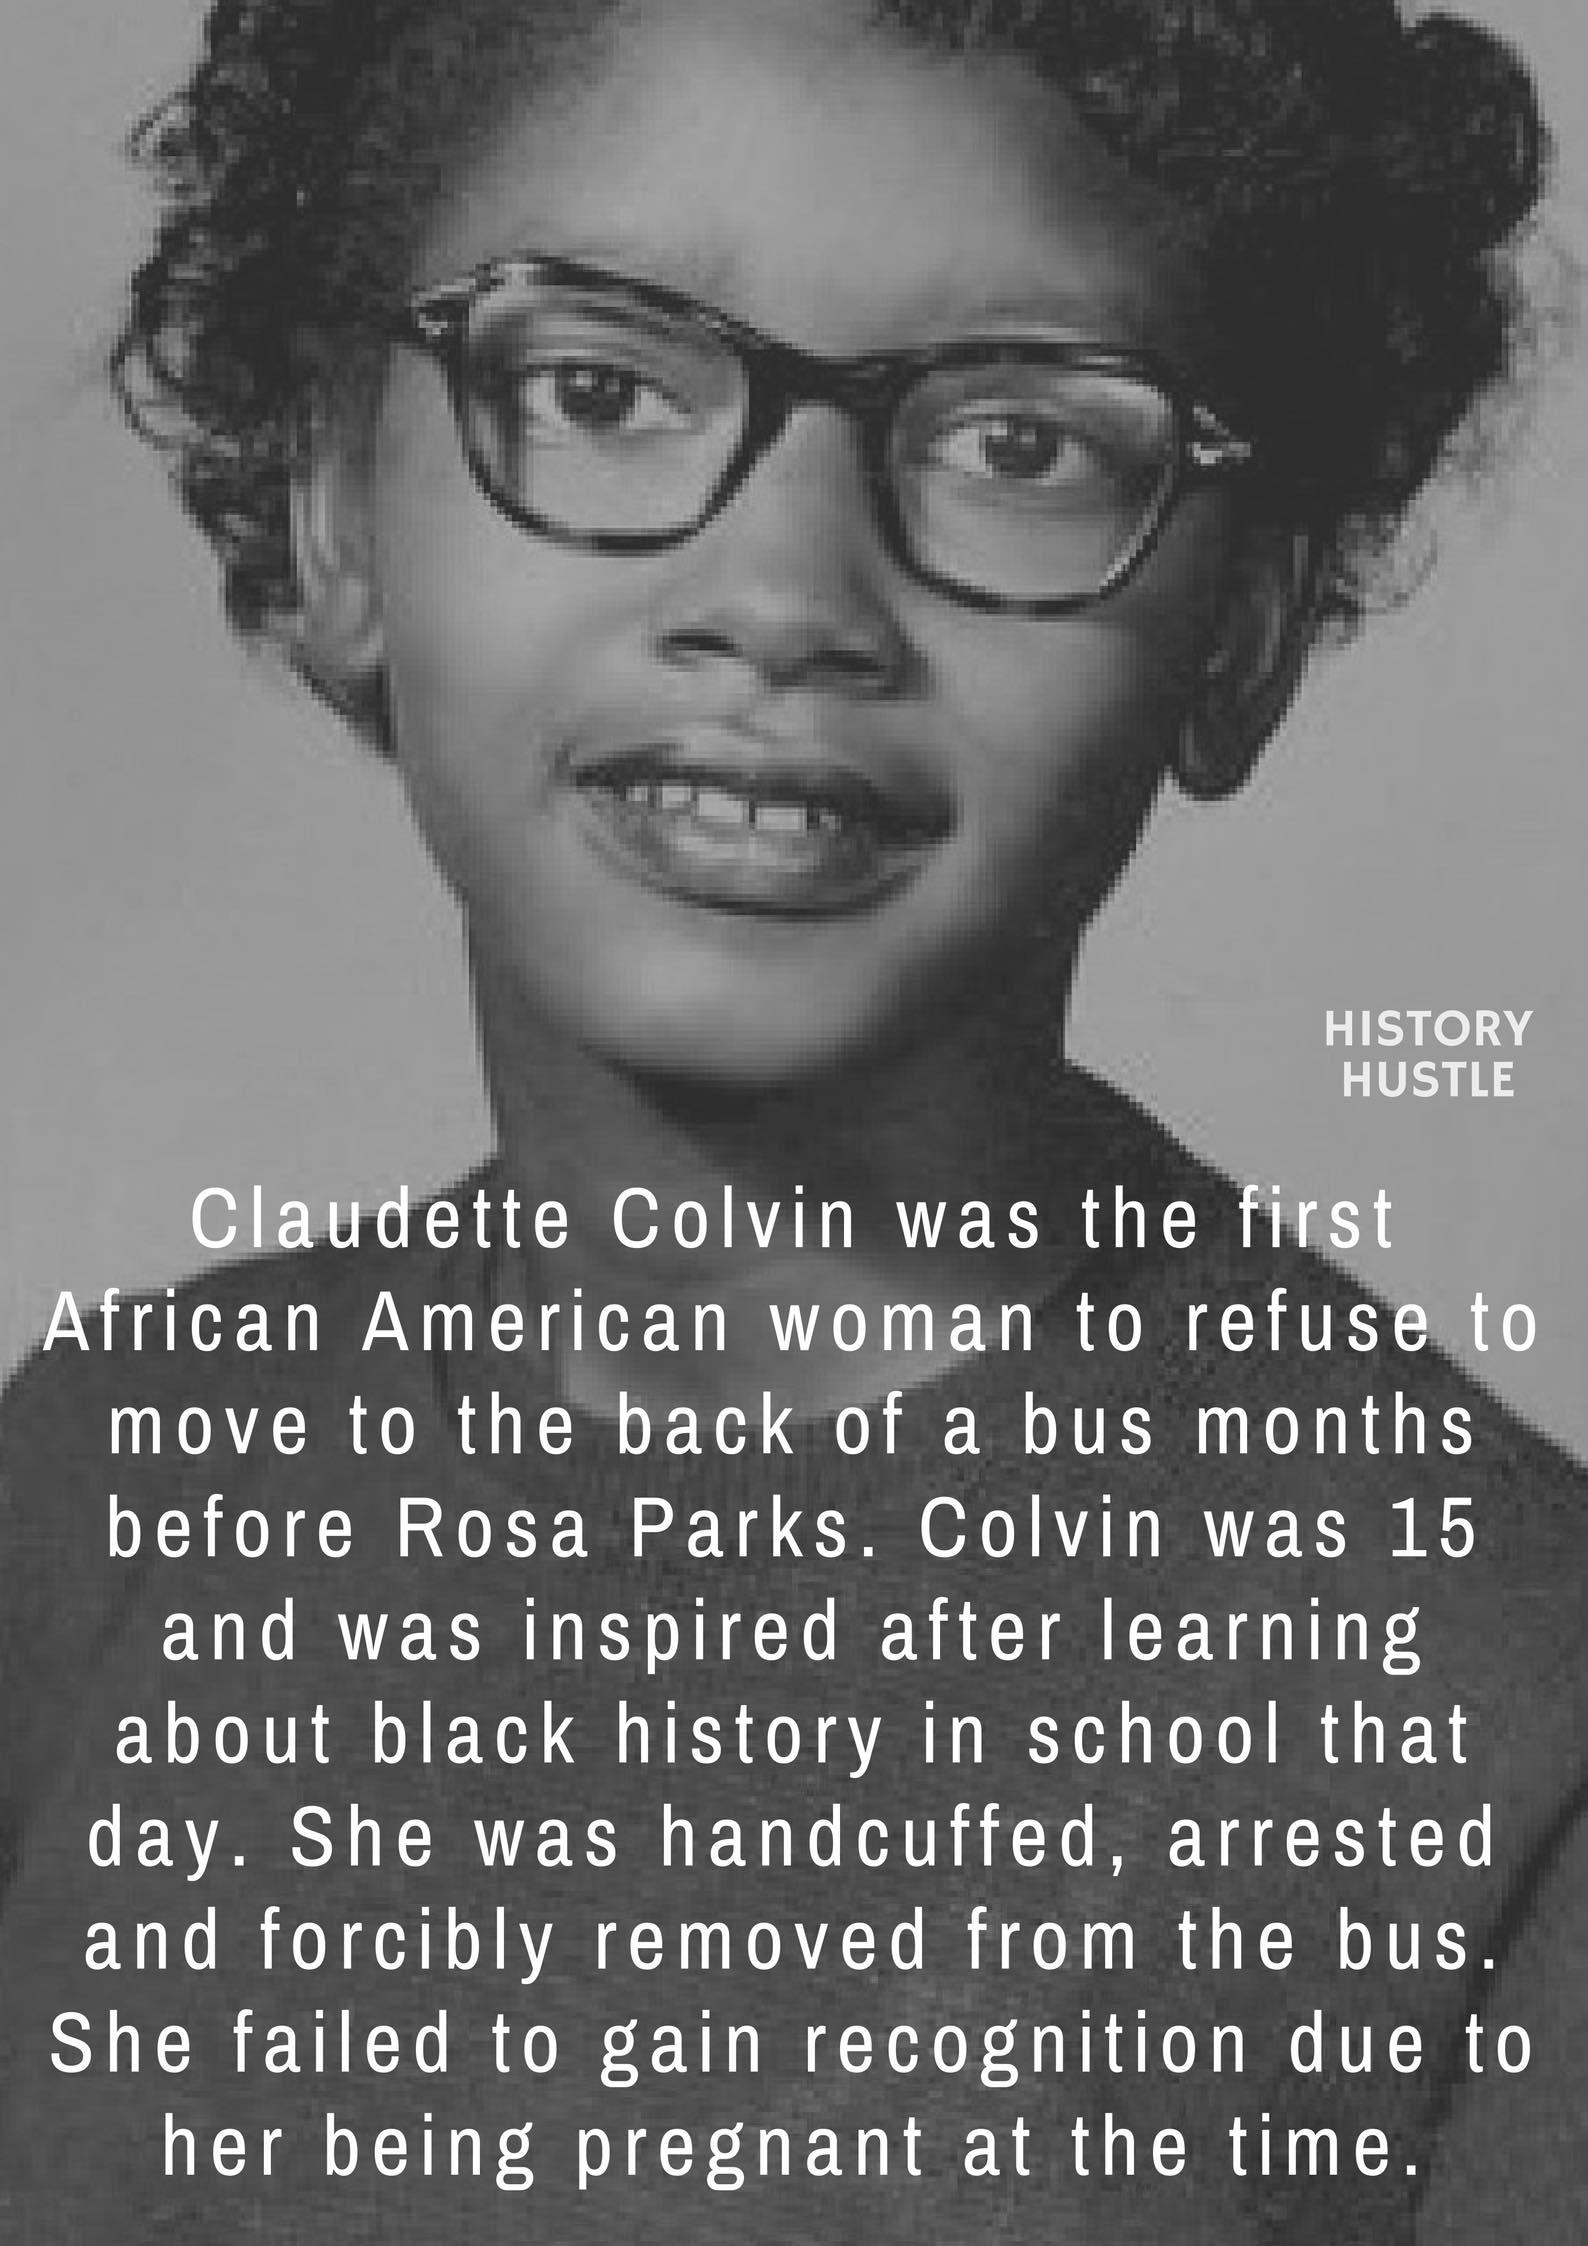 History Hustle Claudette Colvin fact fact